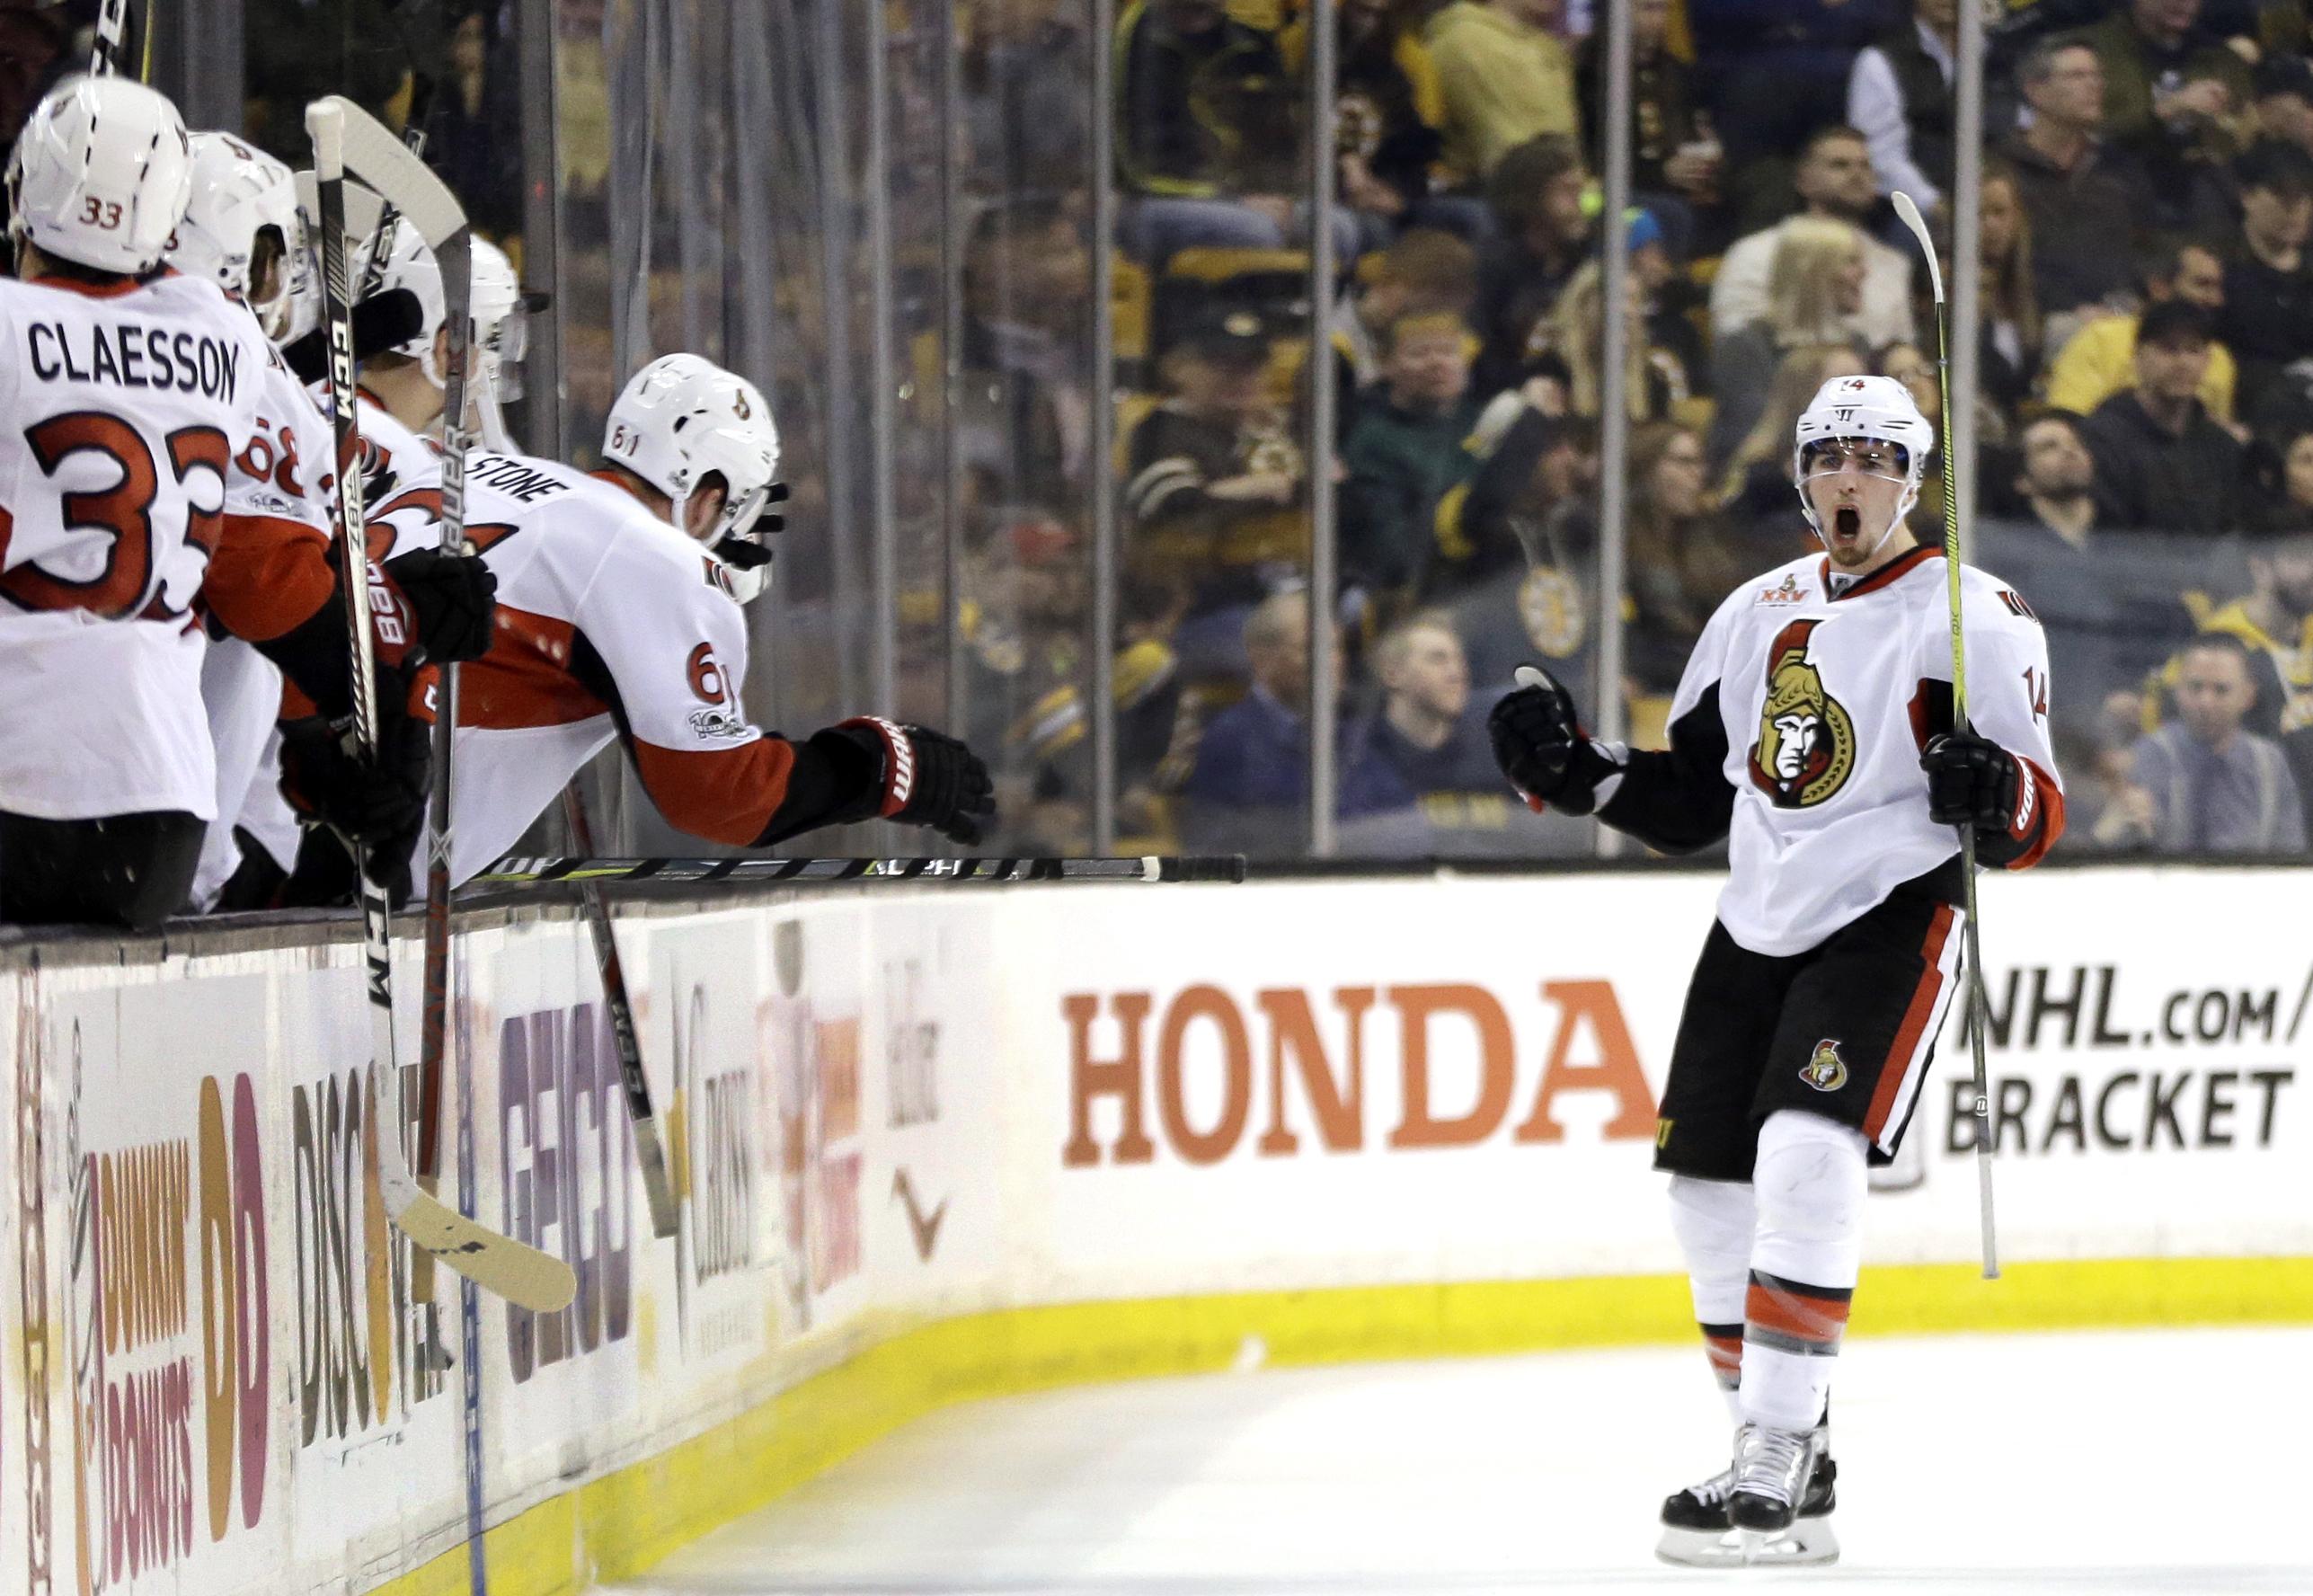 Ottawa Senators left wing Alexandre Burrows (14) celebrates his goal against the Boston Bruins during the second period of an NHL hockey game, Thursday, April 6, 2017, in Boston. (AP Photo/Elise Amendola)